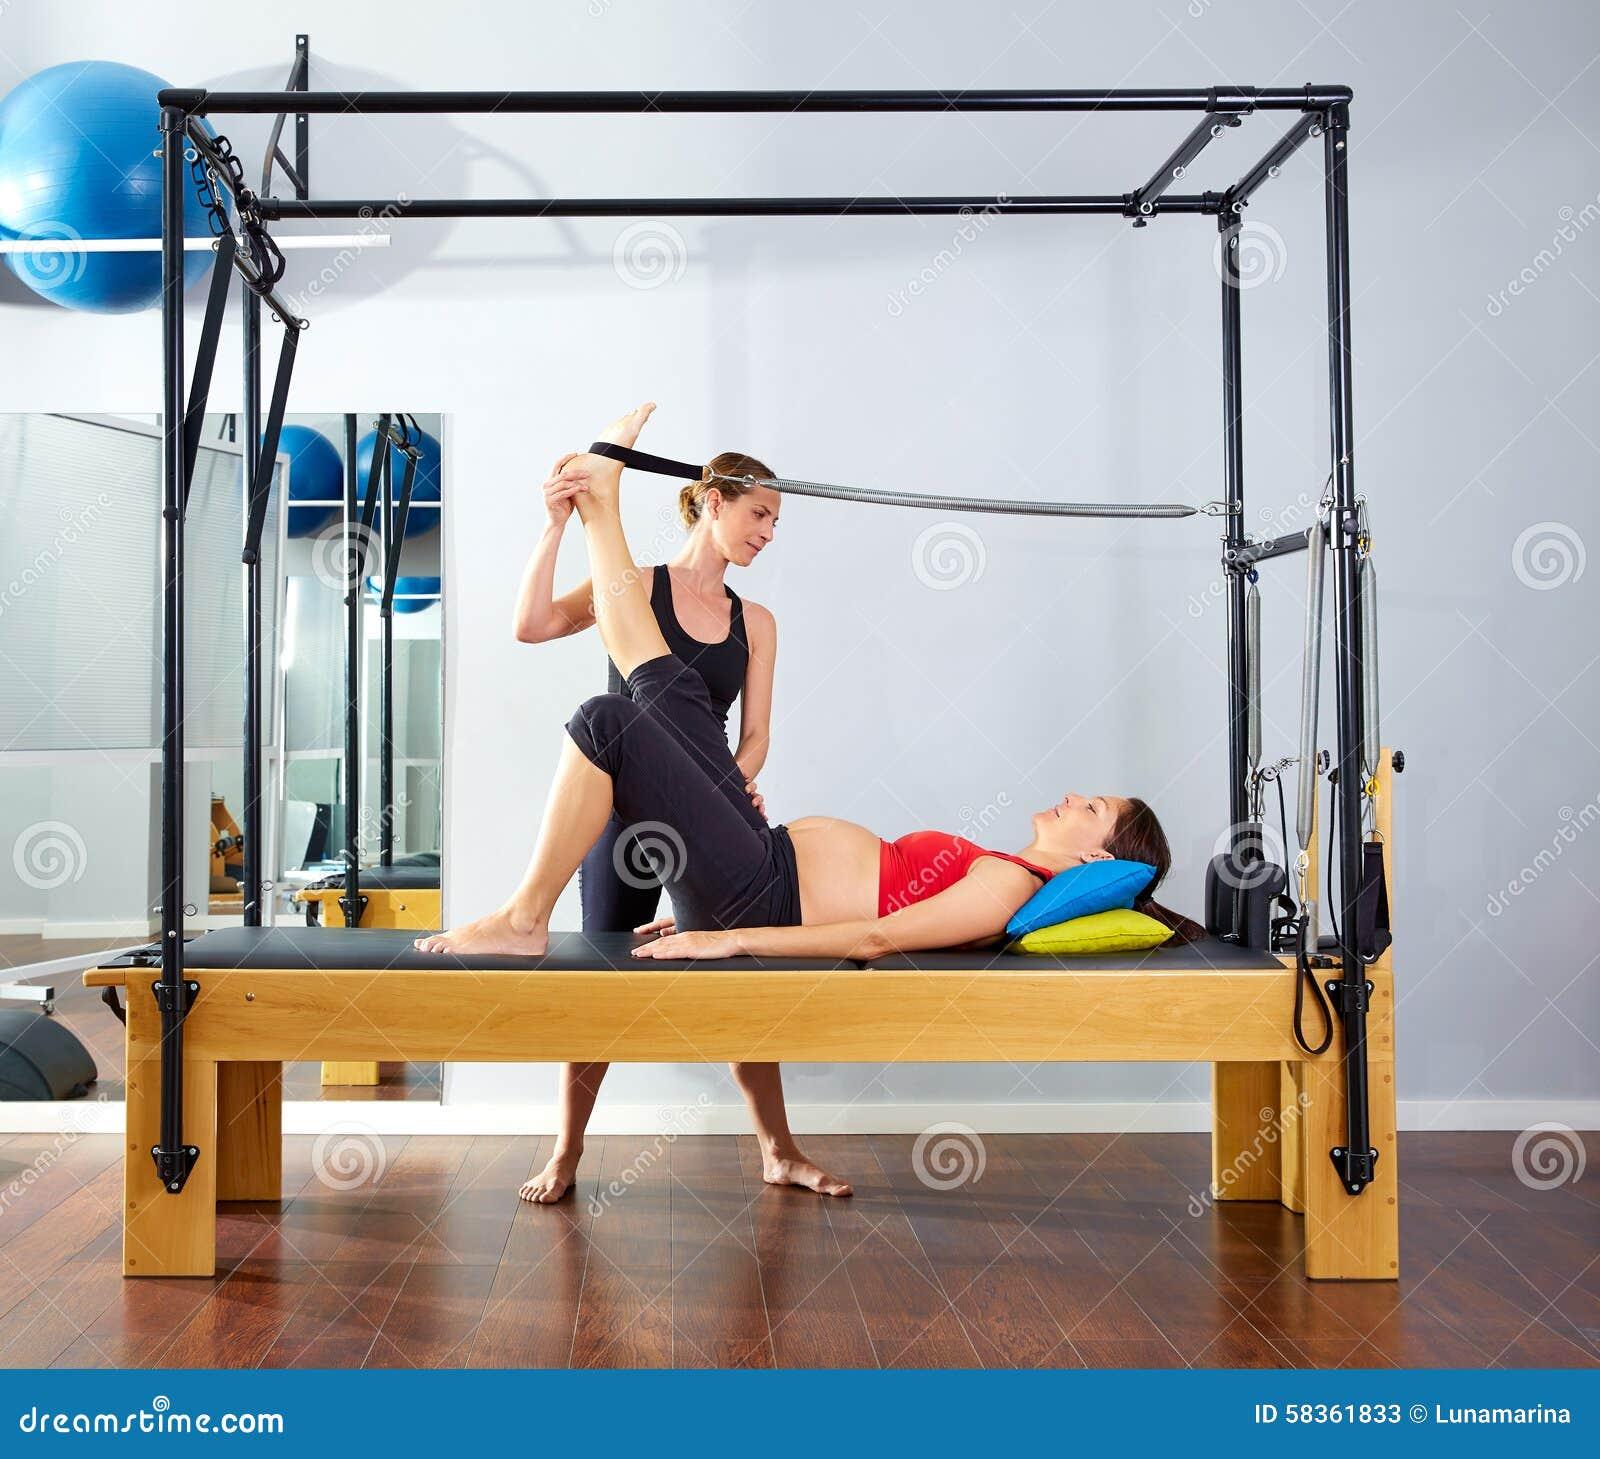 Woman Pilates Chair Exercises Fitness Stock Photo: Pregnant Woman Pilates Reformer Leg Spring Stock Photo